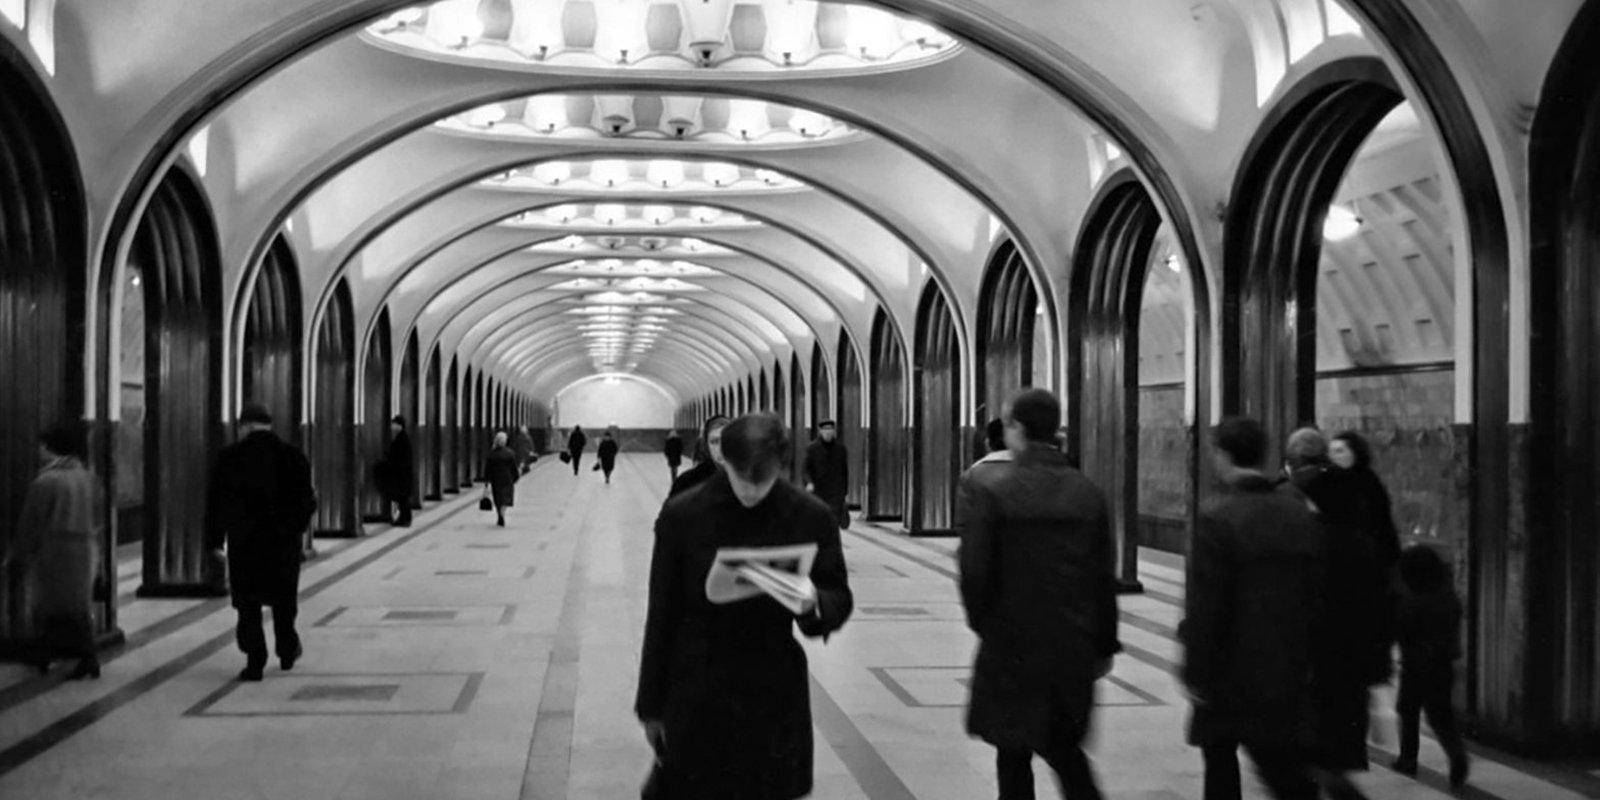 Станция метро «Маяковская». Автор Е.П. Умнов. 1970 год